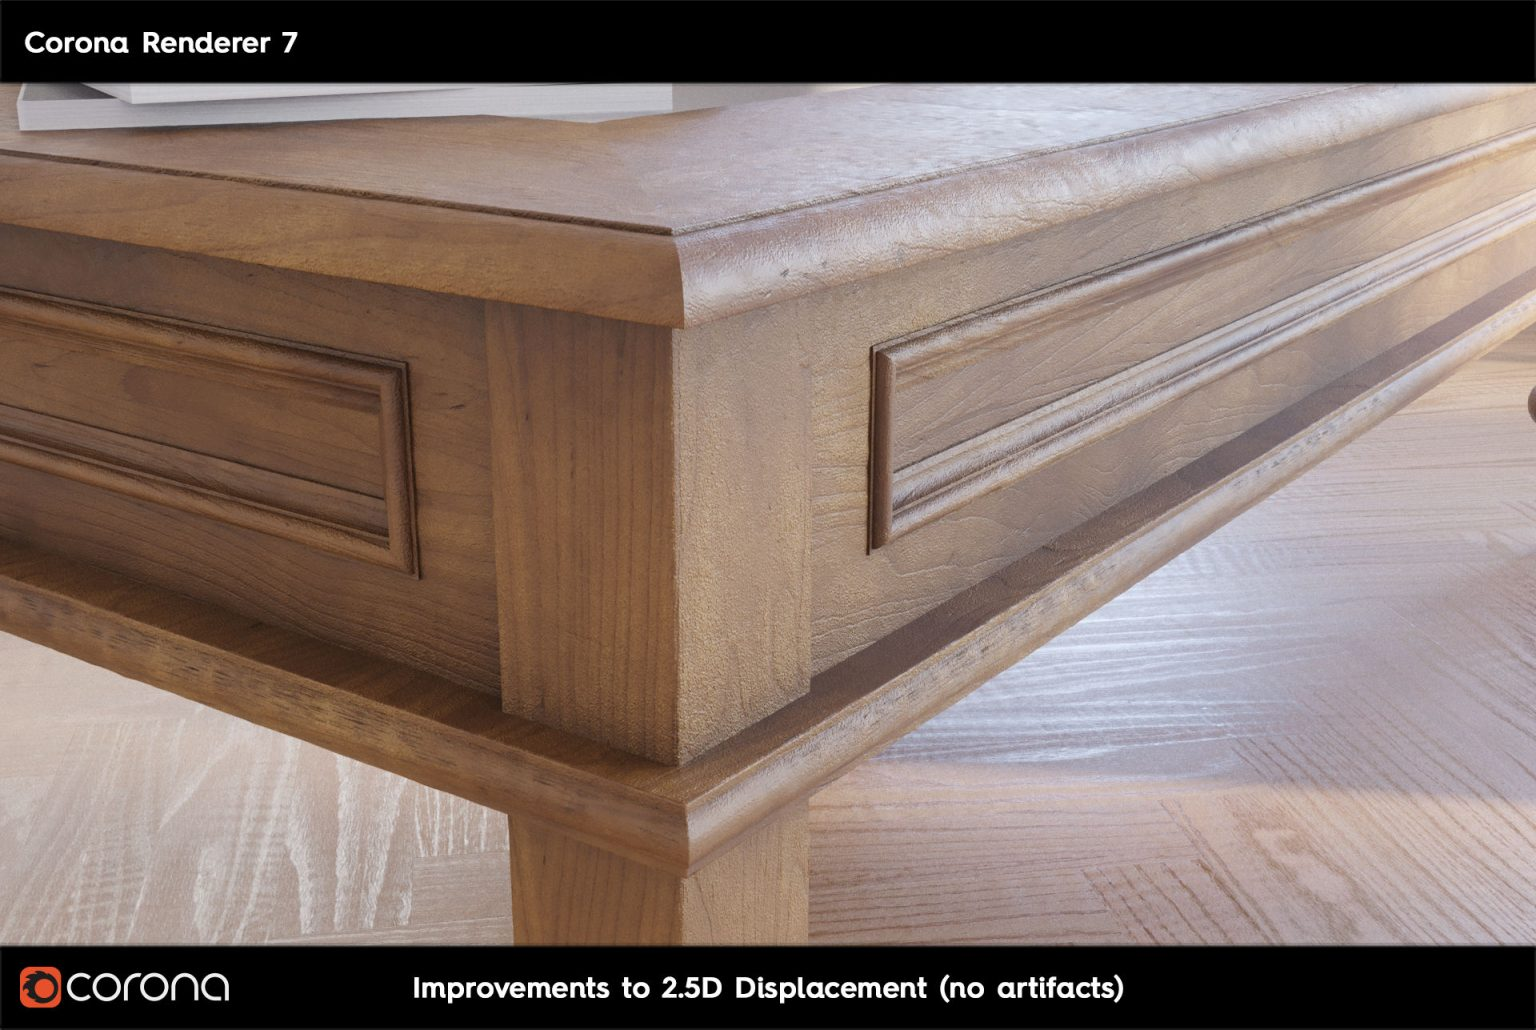 Corona Renderer 7: TUTTE LE NOVITA' - 2.D Displacement A